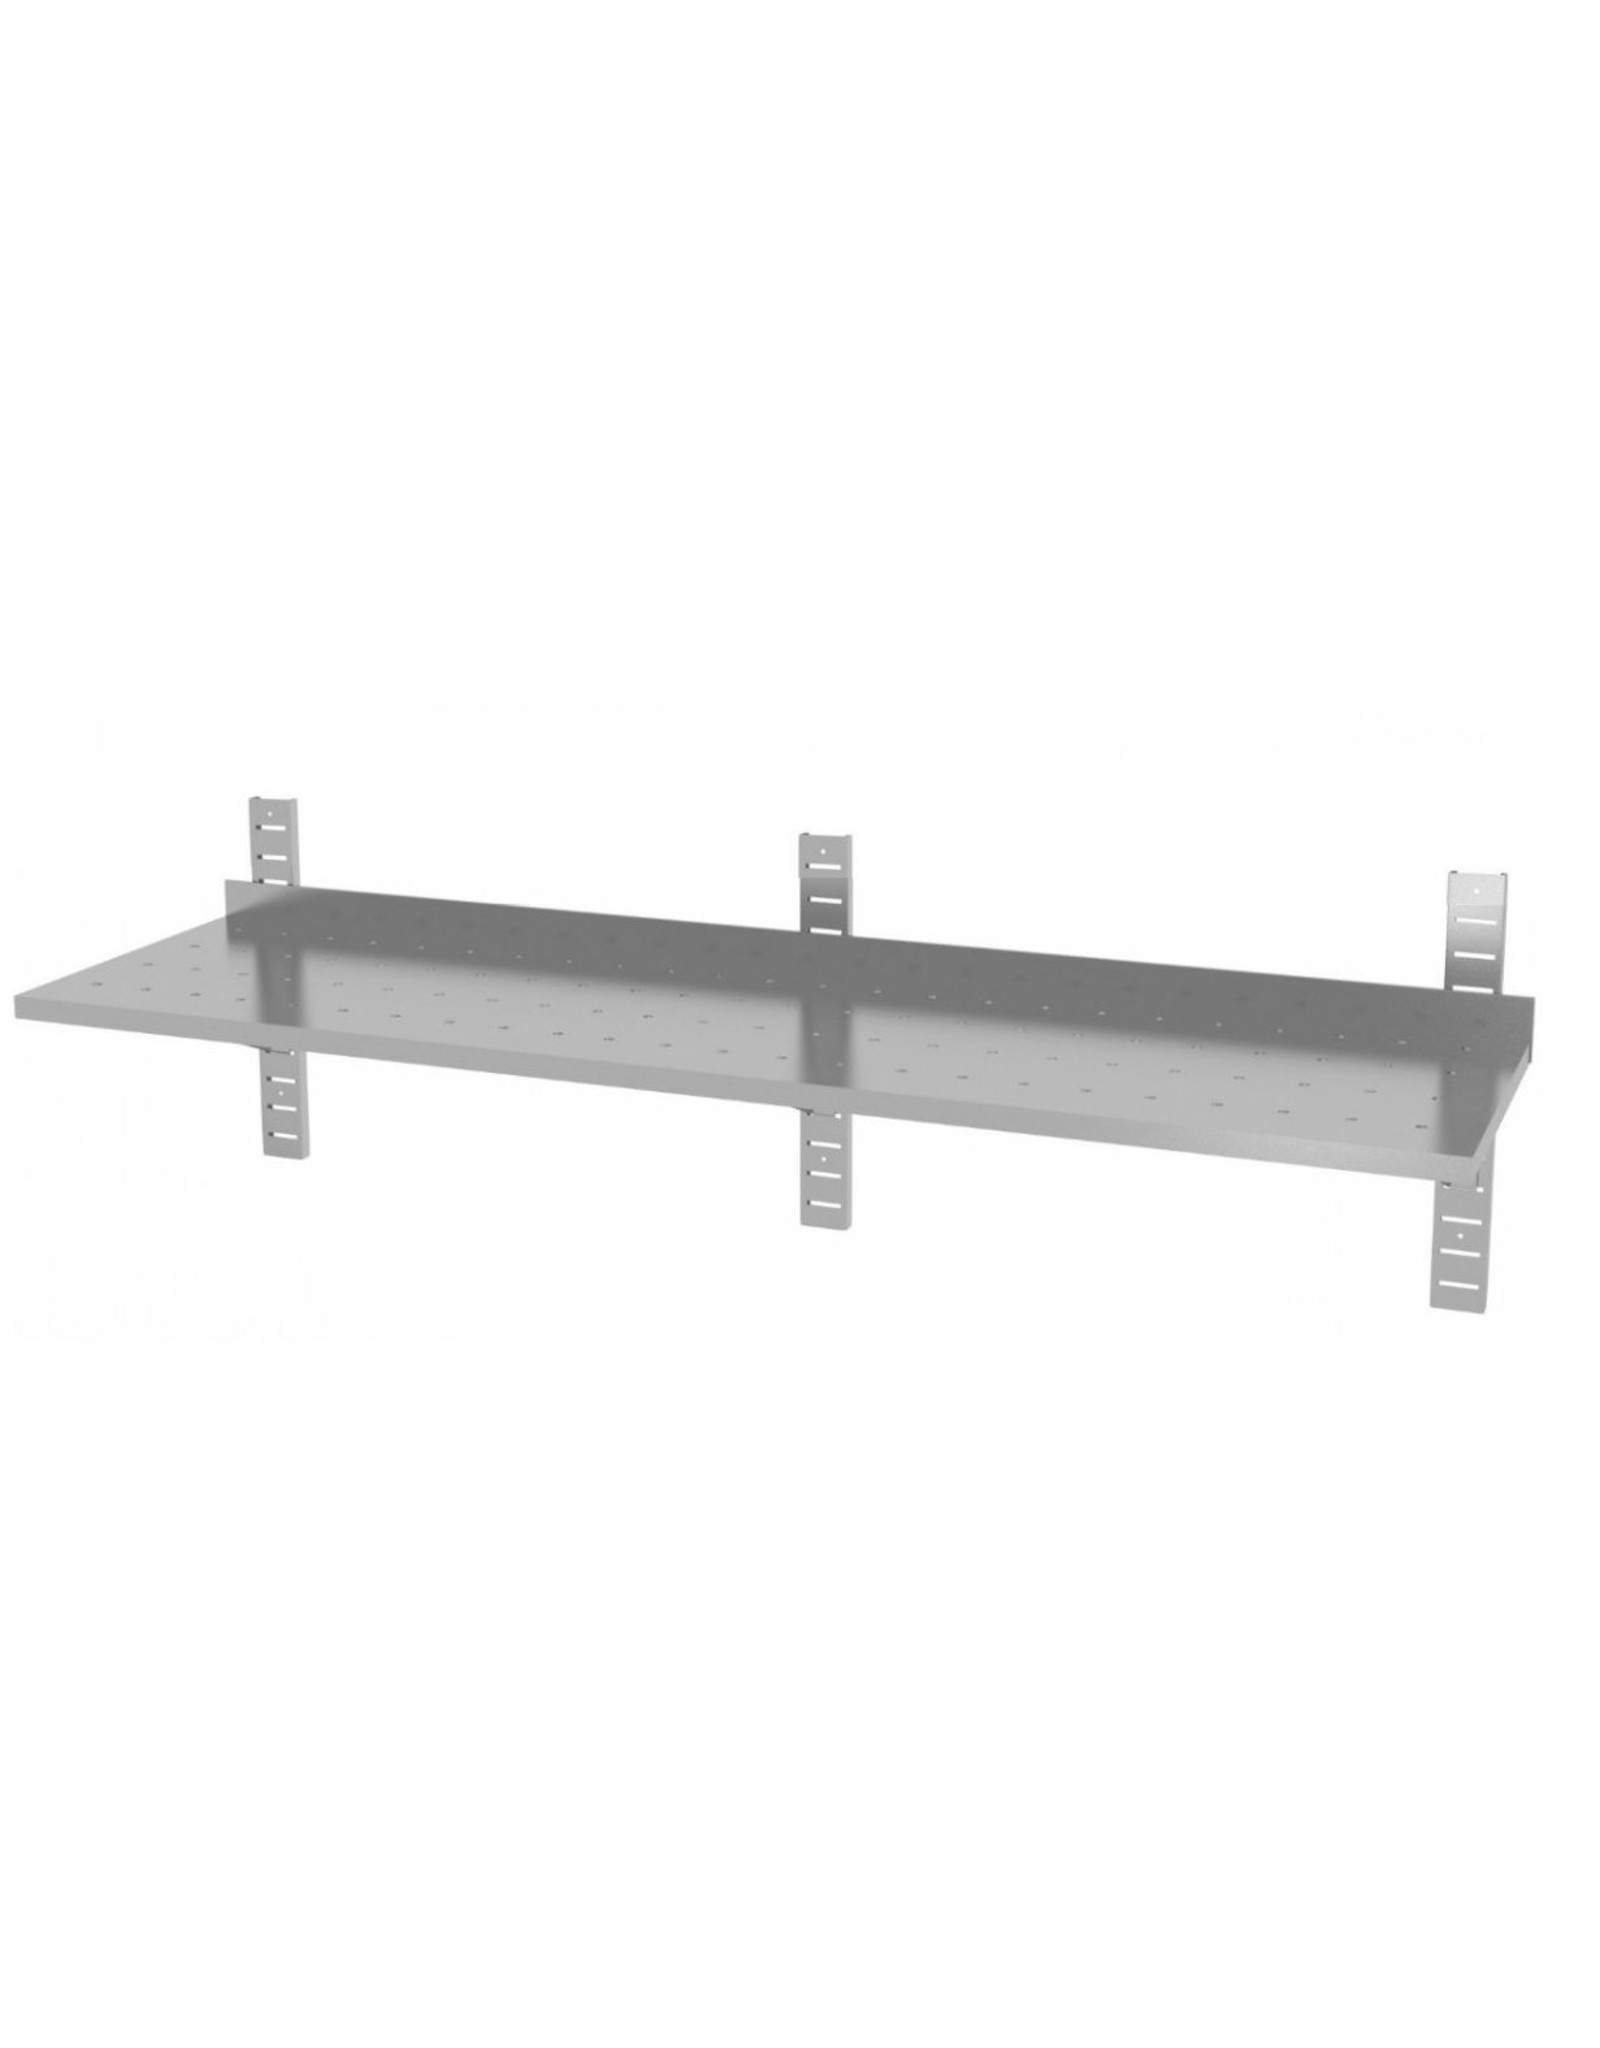 Wandplank geperforeerd | 1 plank | met 3 beugels | 1600-2000mm breed | 300 of 400mm diep